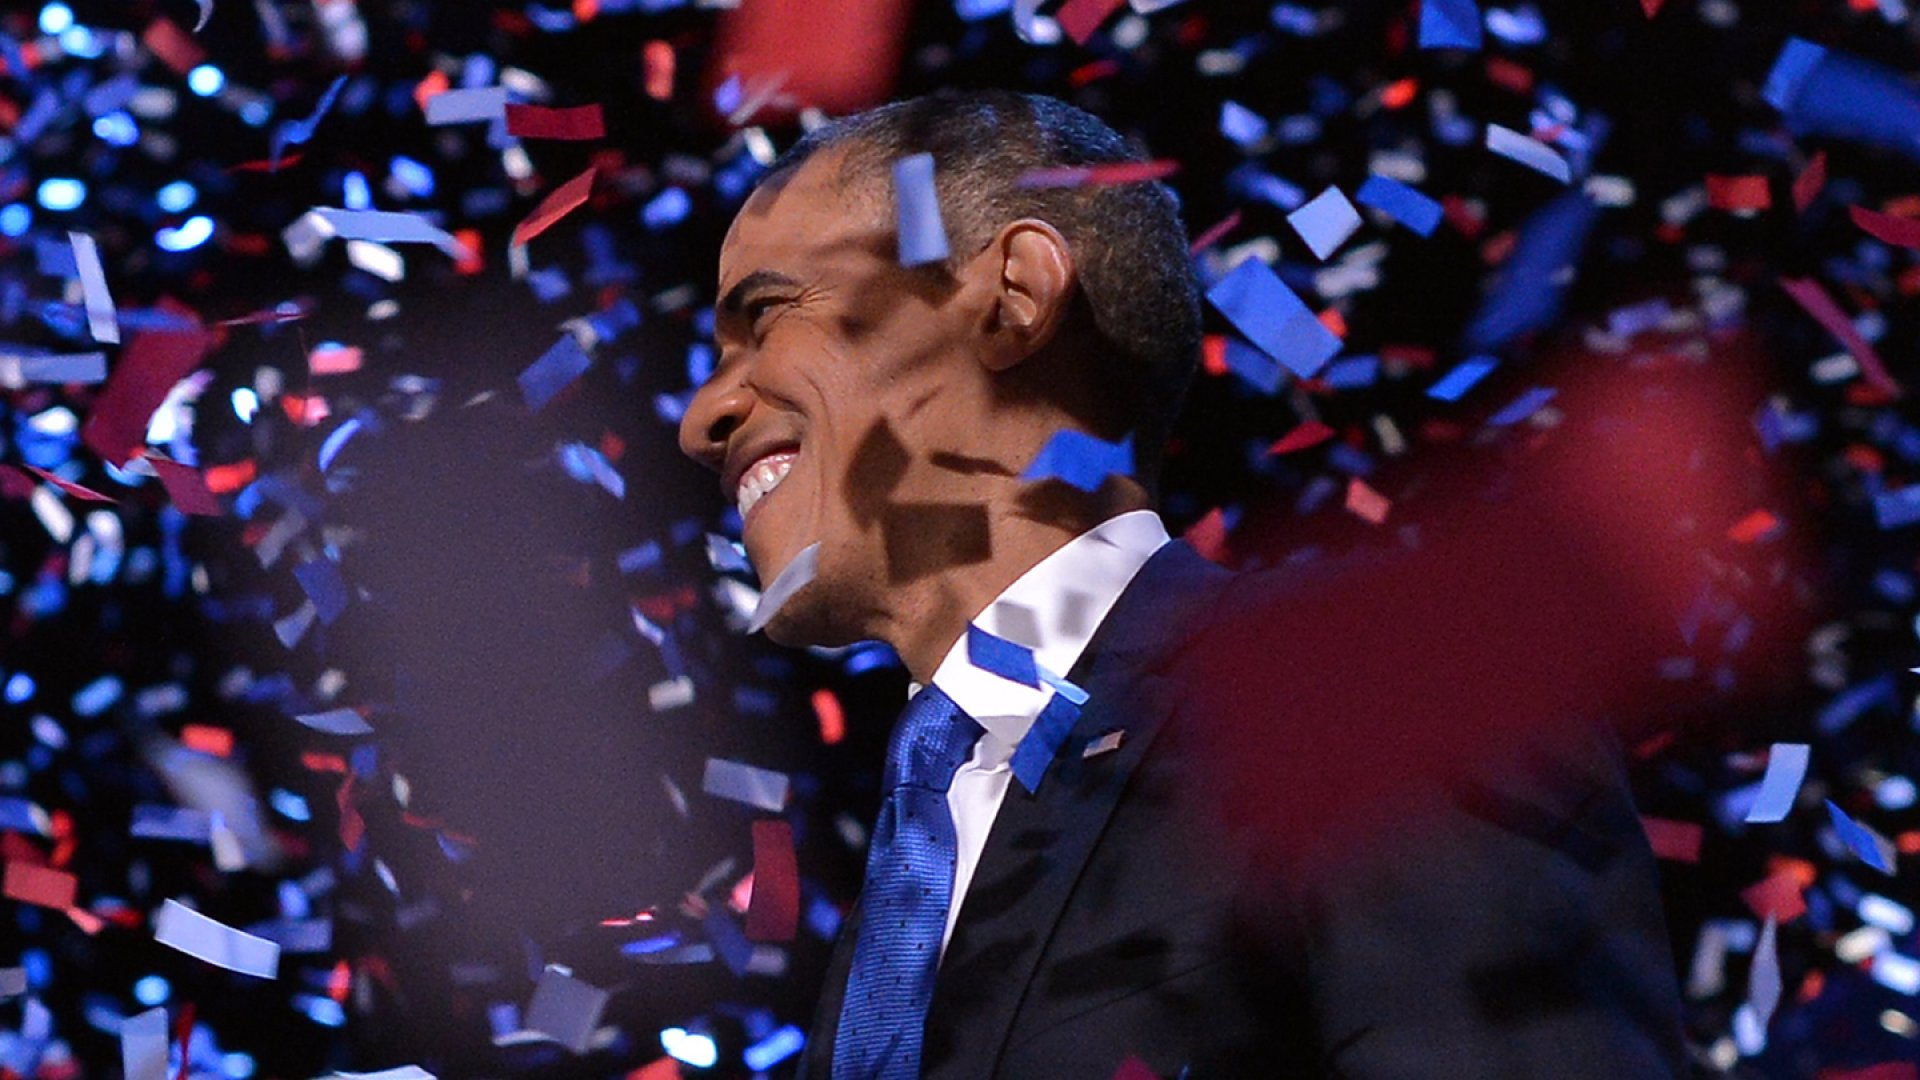 US President Barack Obama celebrates after delivering his acceptance speech in Chicago.